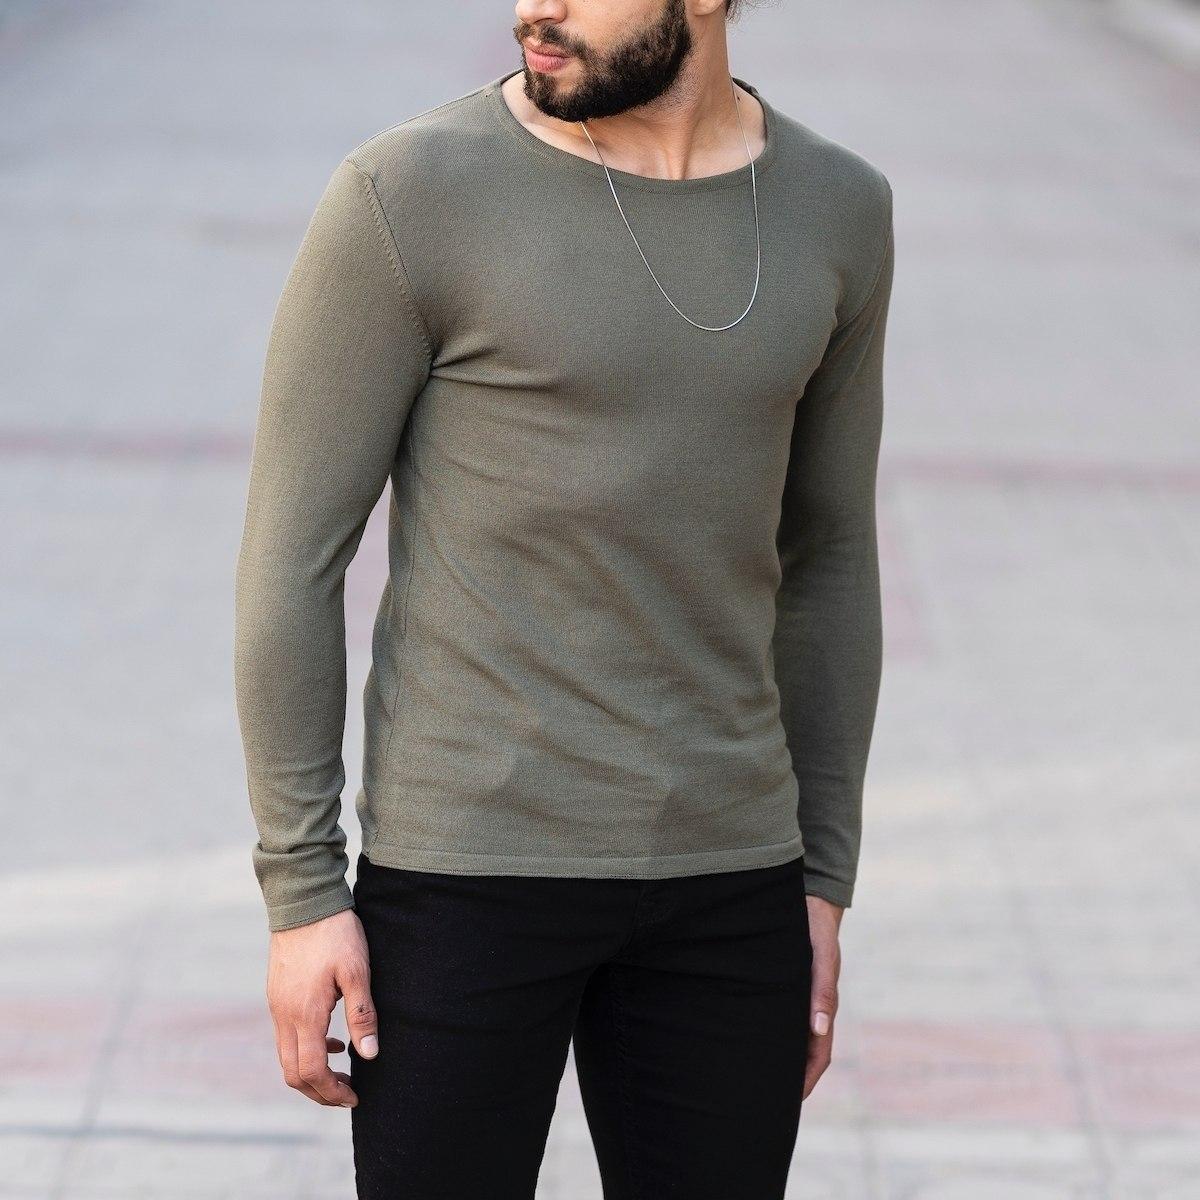 Slim-Fitting Classic Round-Neck Sweater in Khaki Mv Premium Brand - 2